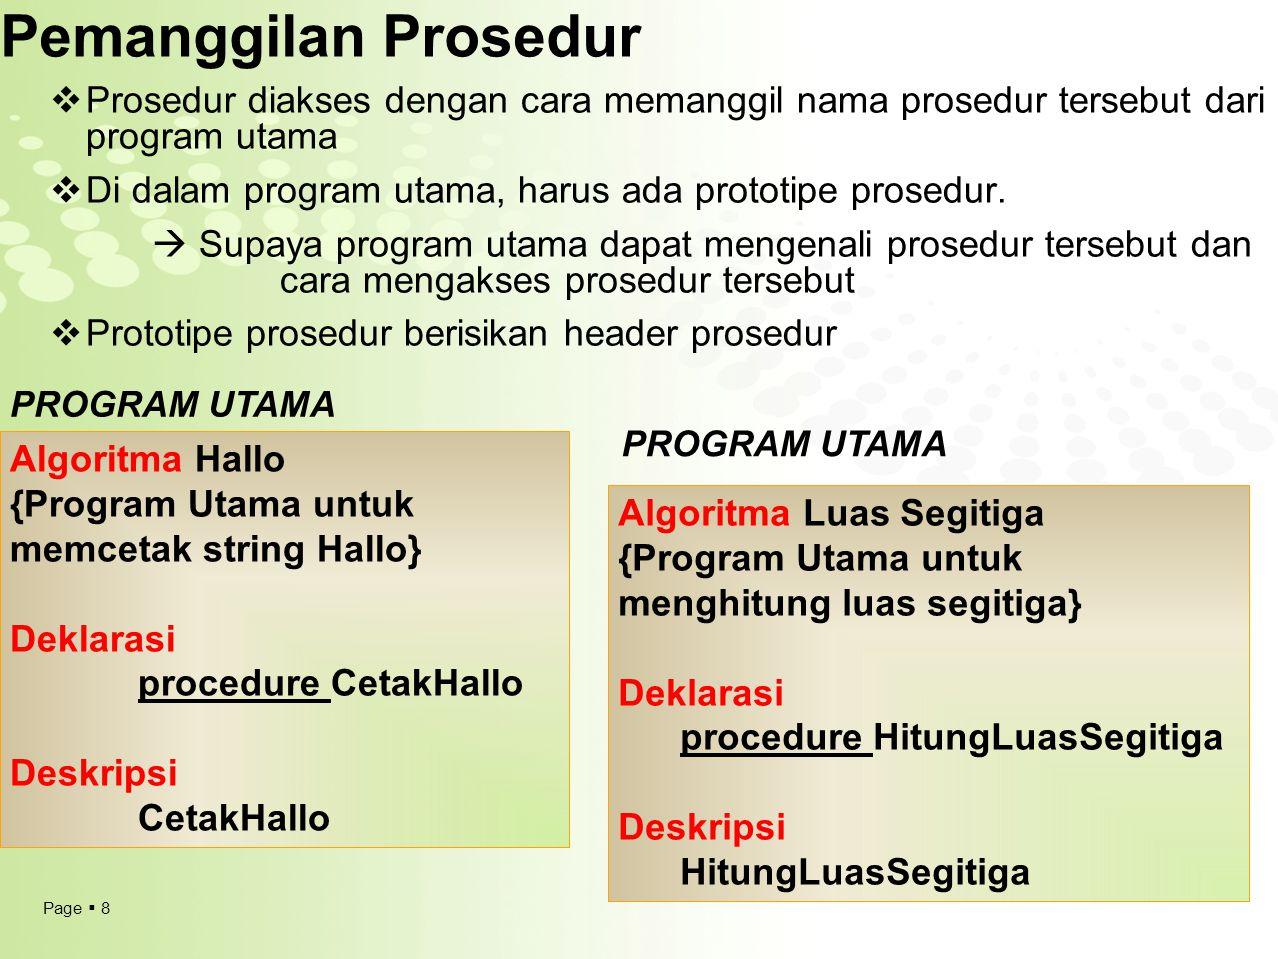 Page  8 Pemanggilan Prosedur  Prosedur diakses dengan cara memanggil nama prosedur tersebut dari program utama  Di dalam program utama, harus ada p